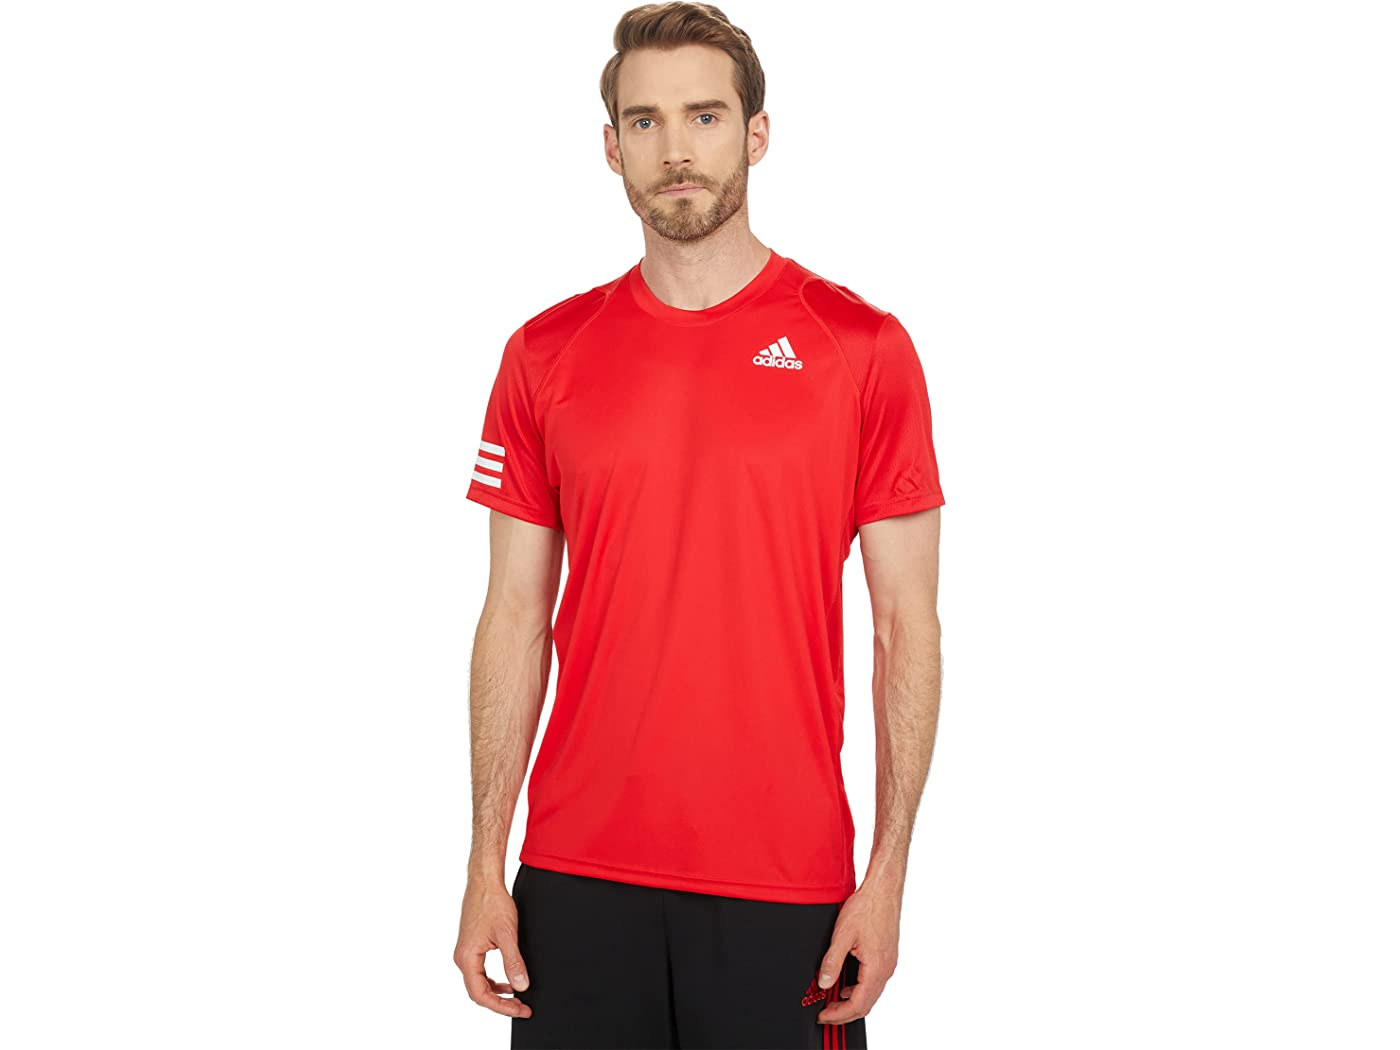 Adidas Club 3-Stripes Tee